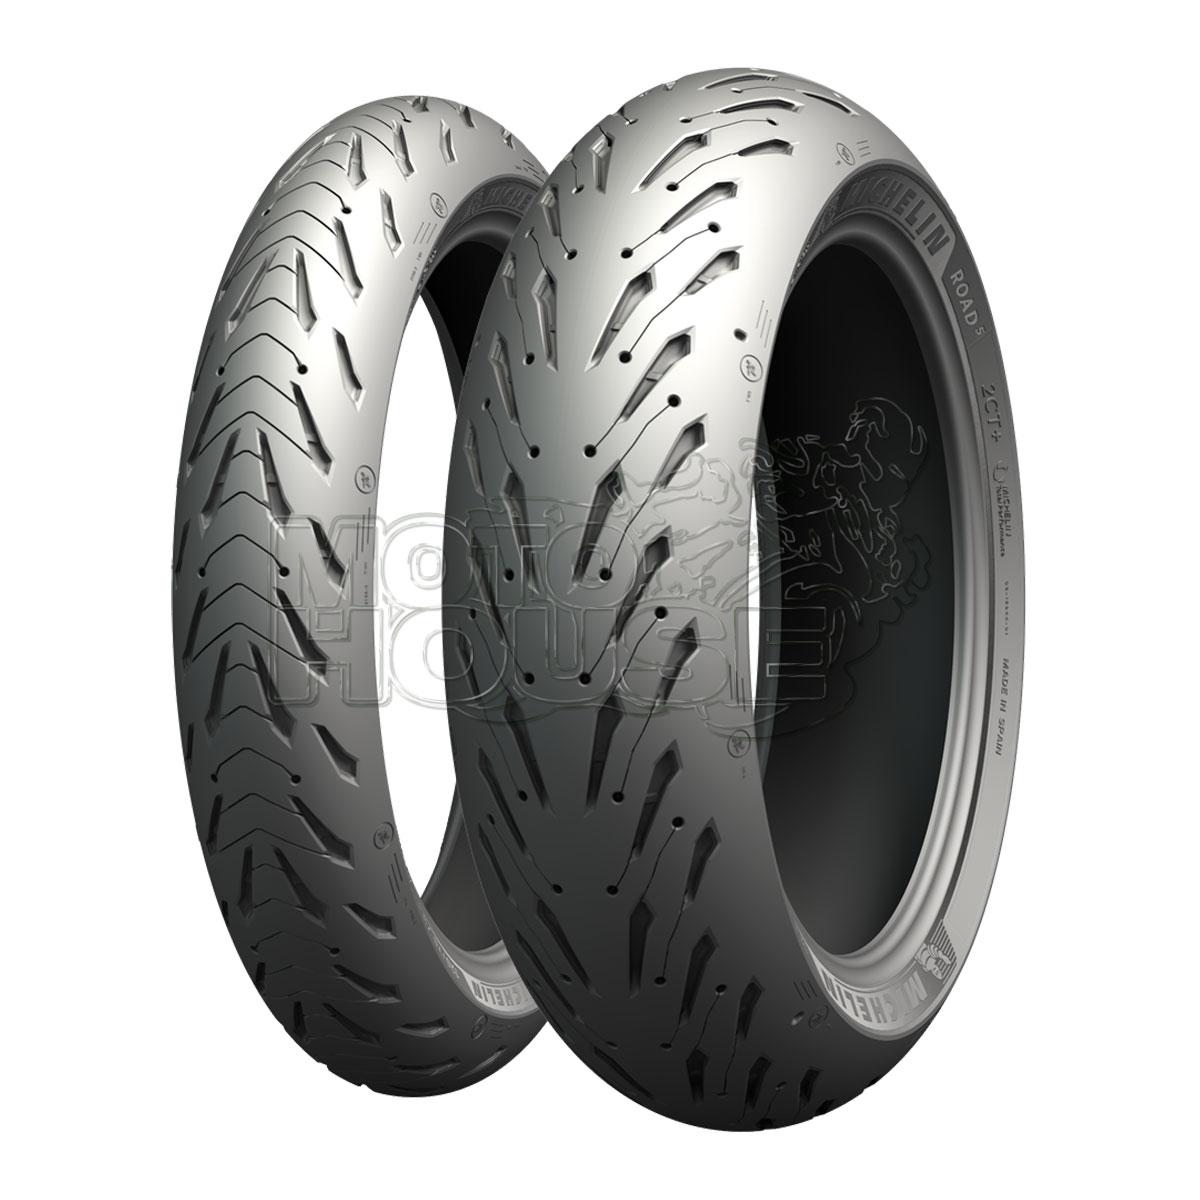 Llanta Para Moto Michelin Road 5 120/70 Zr 17 58w